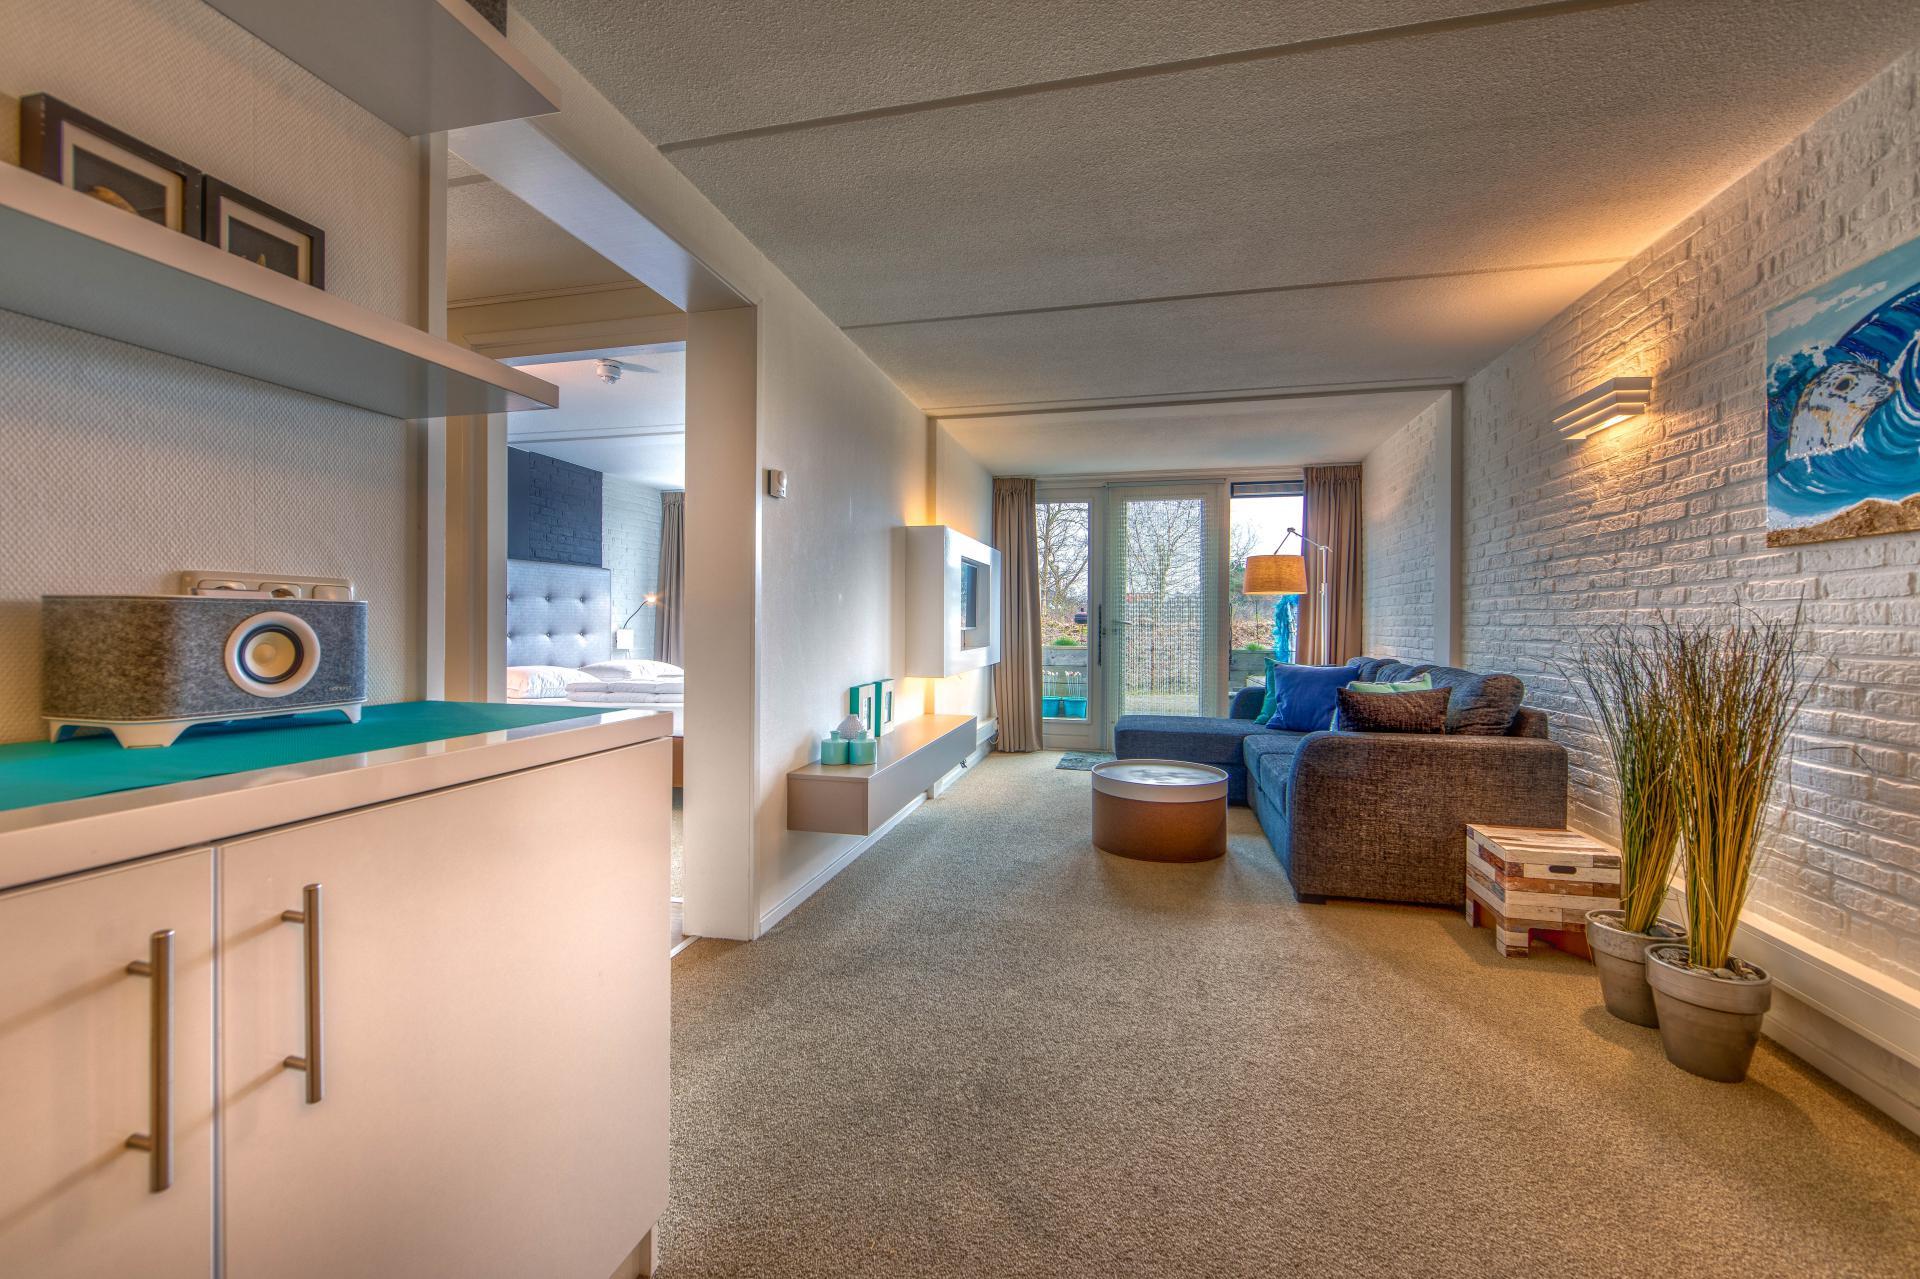 Strand Resort Schier Appartement 7 woonkamer en slaapkamer